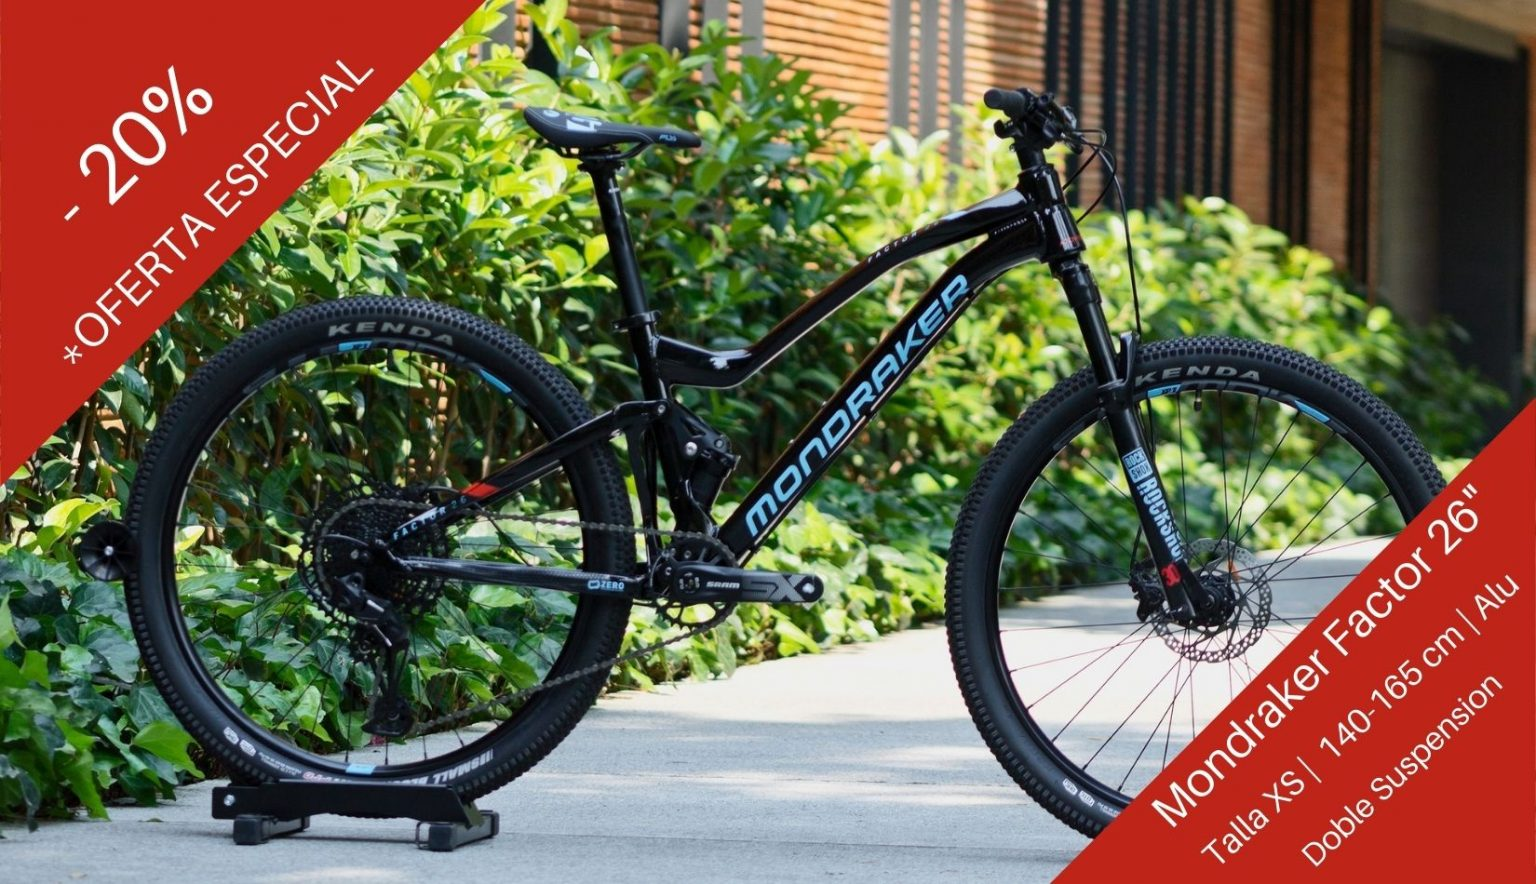 Oferte Descuento Promo Tienda en Linea bicicleta Mondraker Factor 26 pulgadas talla XS chica Alu Mexico Polanco